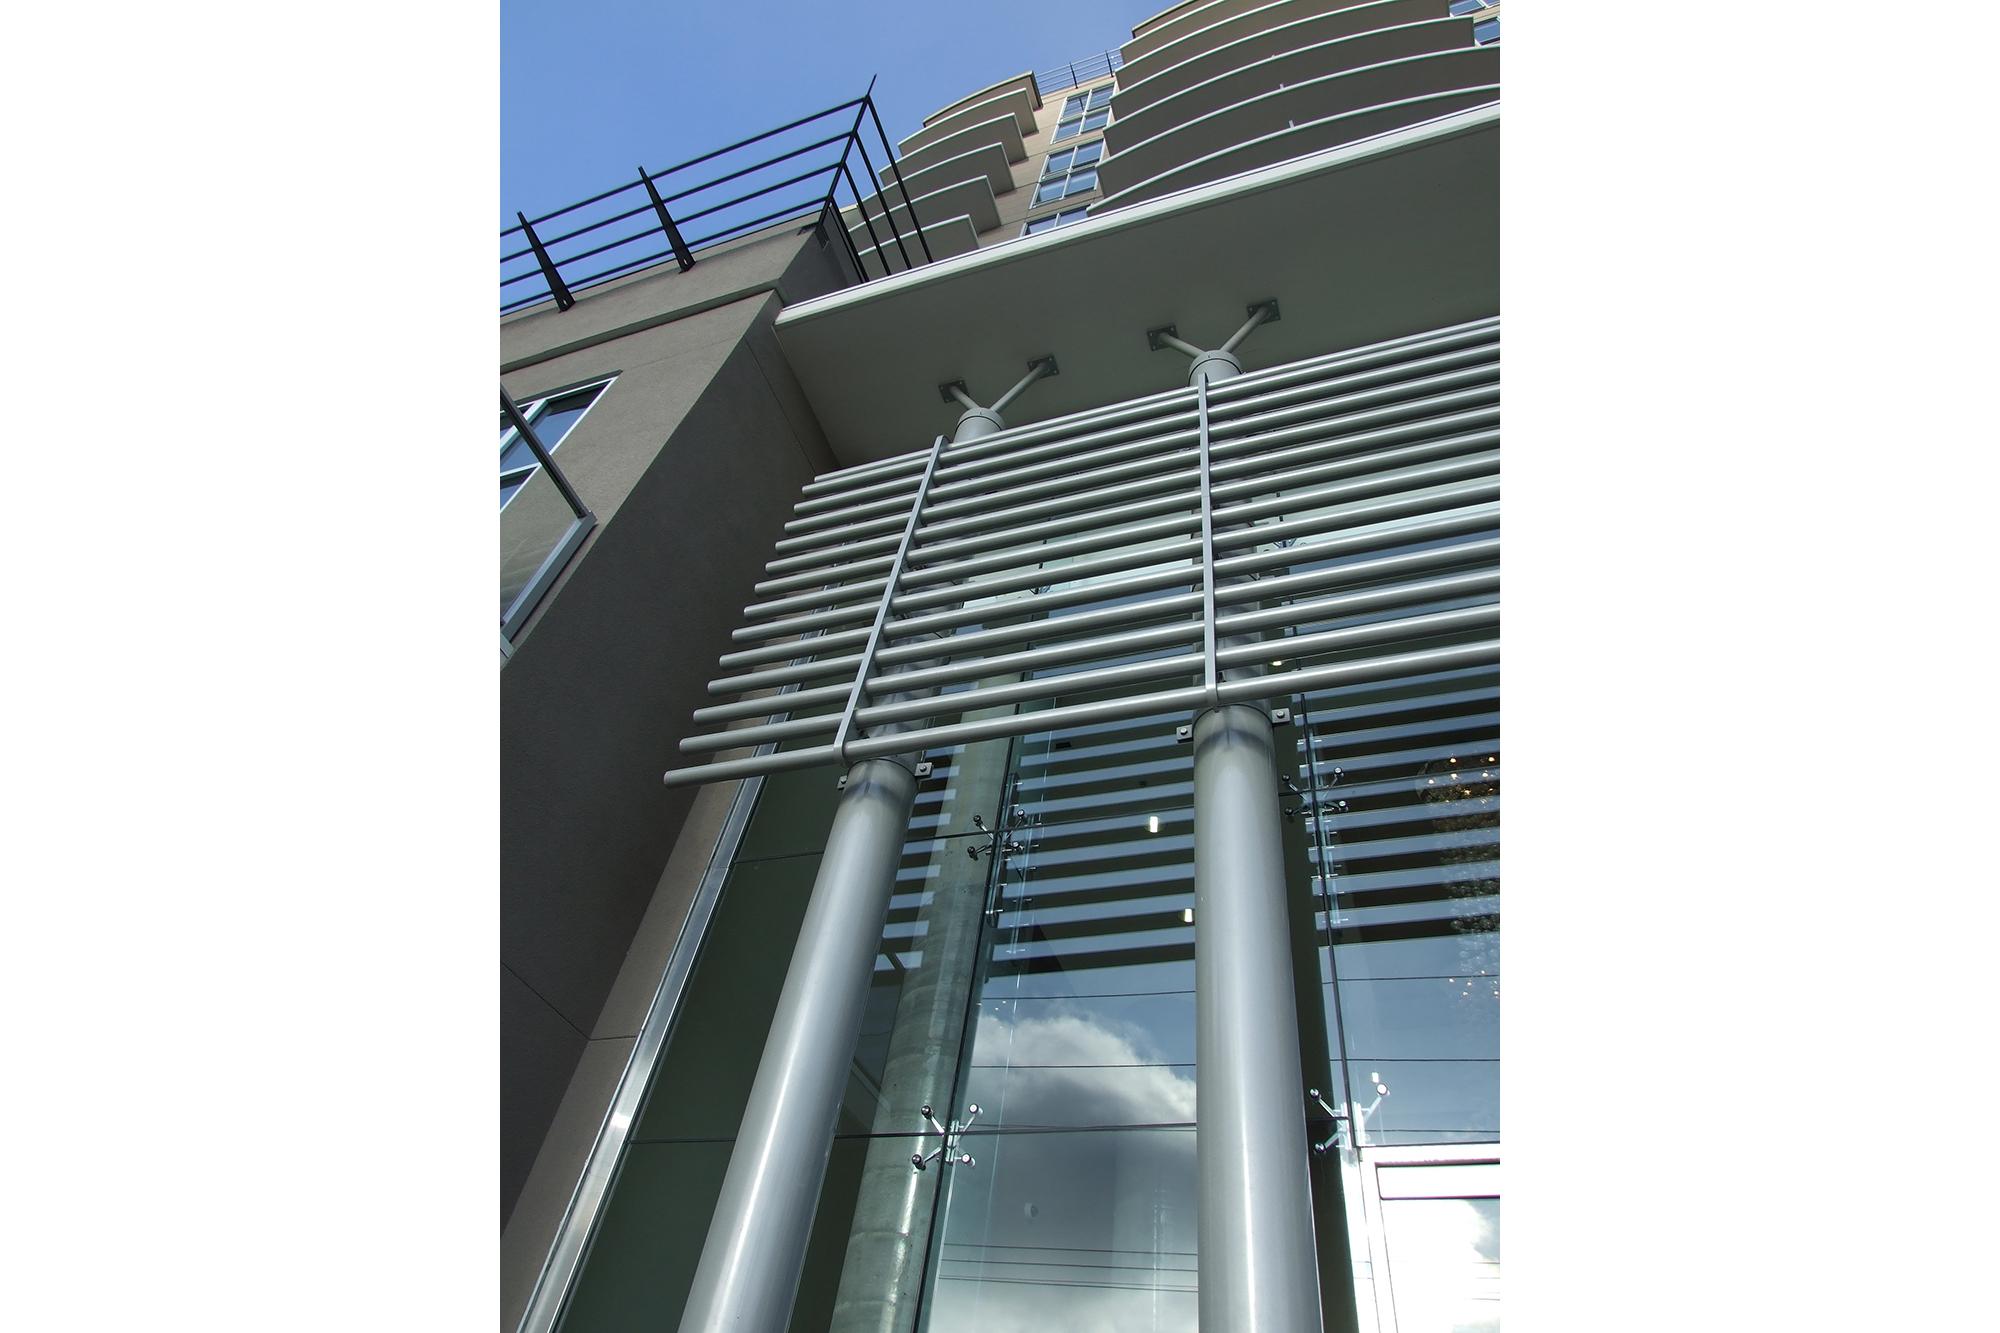 Invue_exterior_0013.JPG